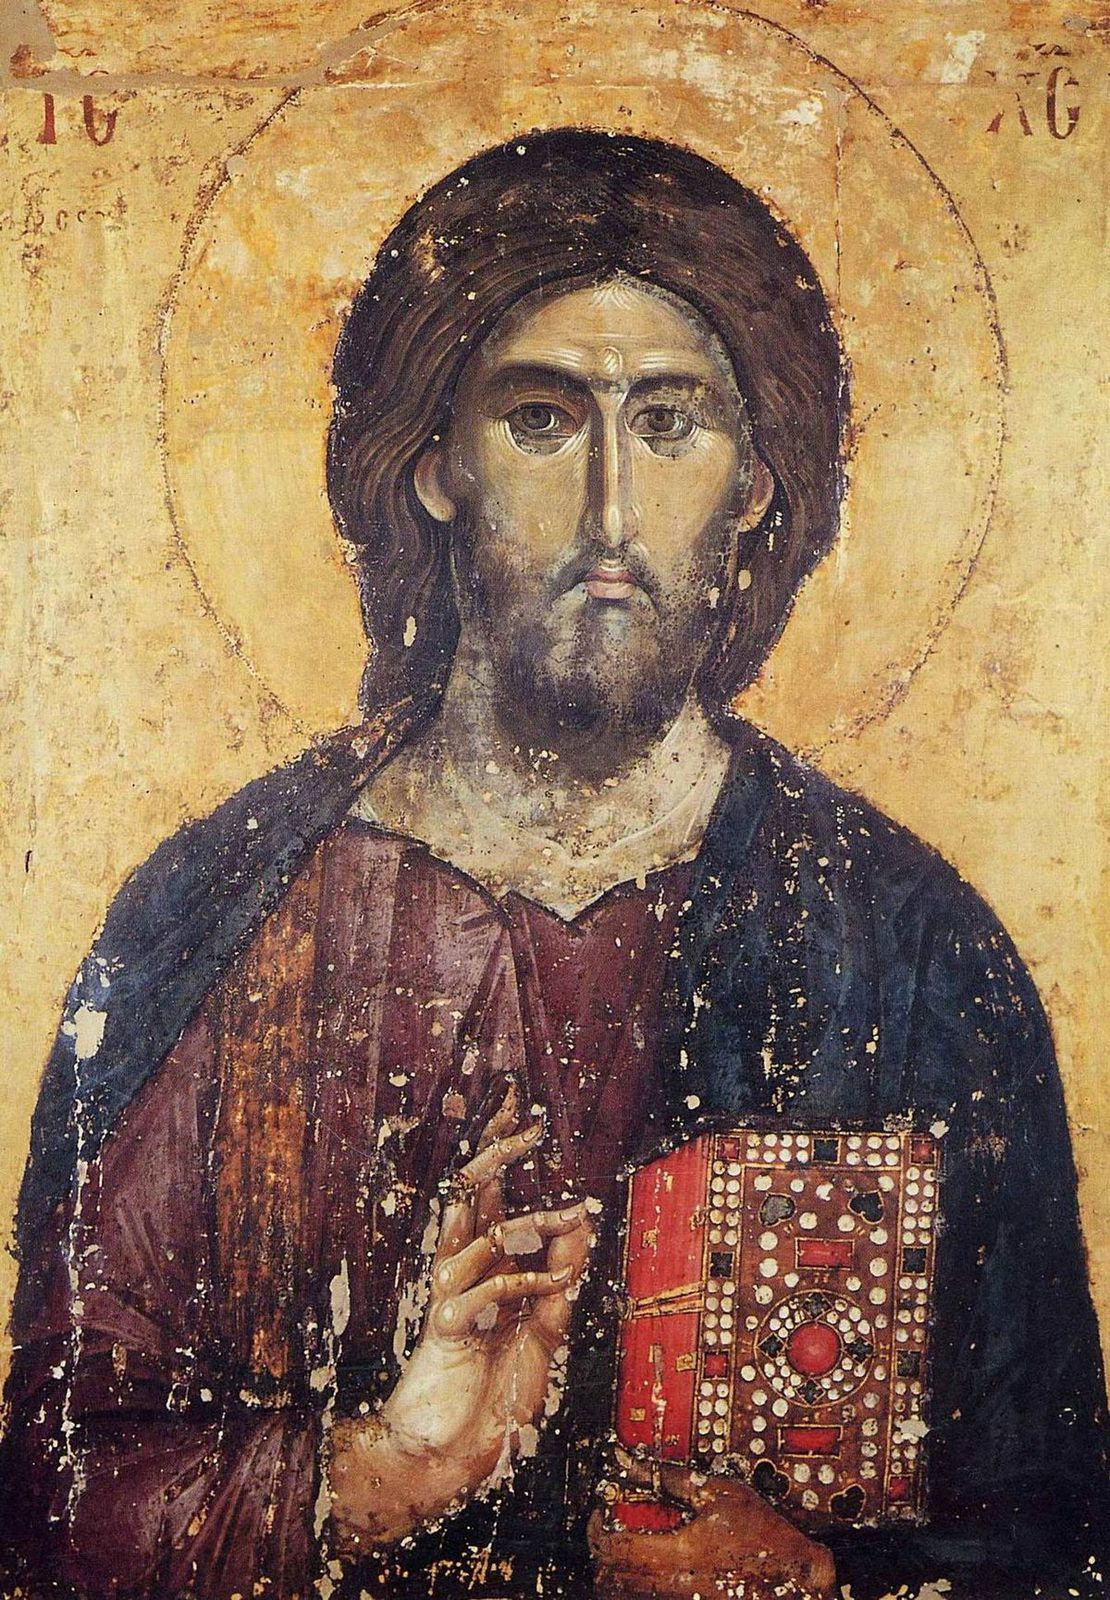 Christ Pantocrator du XIIe siècle -- http://www.video-du-net.fr/peinture/icones-celebres-jesus-christ.php